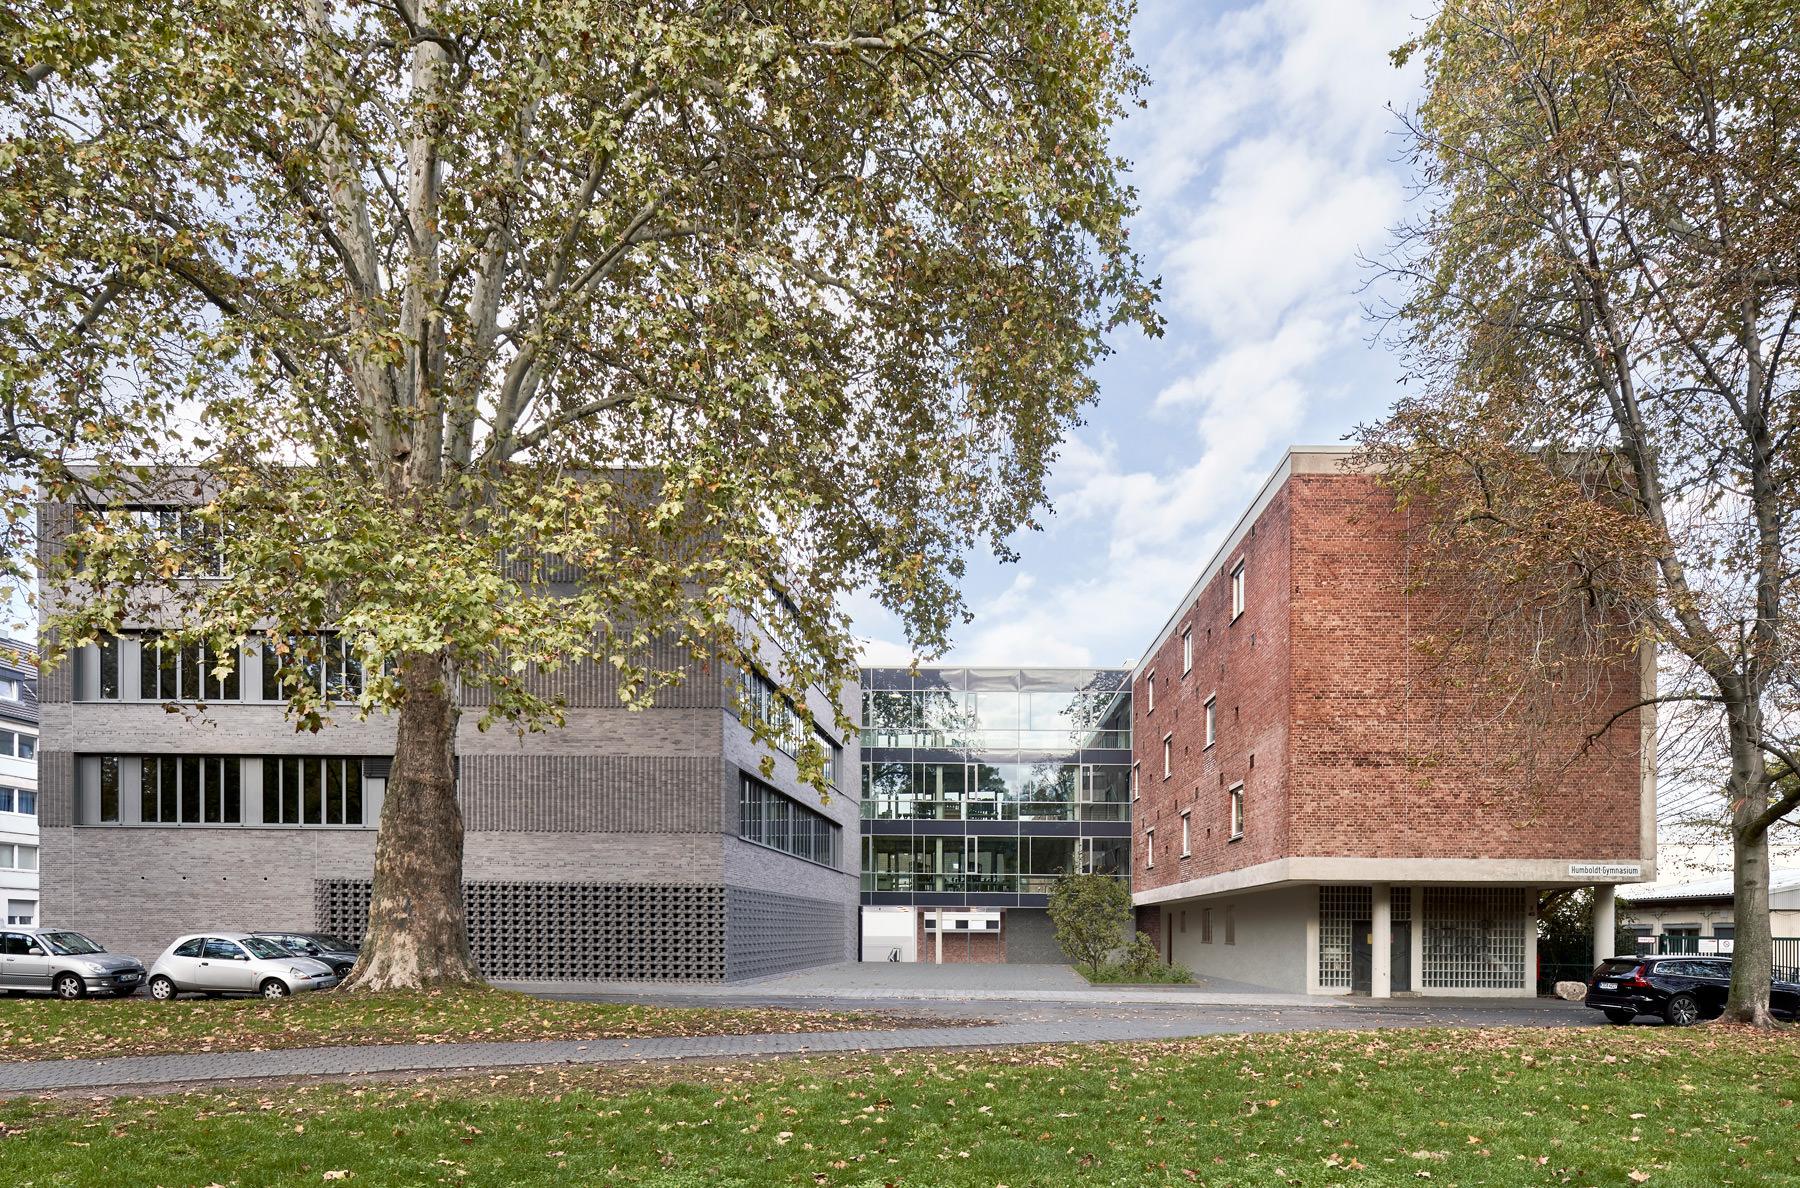 Humboldt-Gymnasium, Köln. NAK-Architektur, Berlin. Fotografie: Annika Feuss